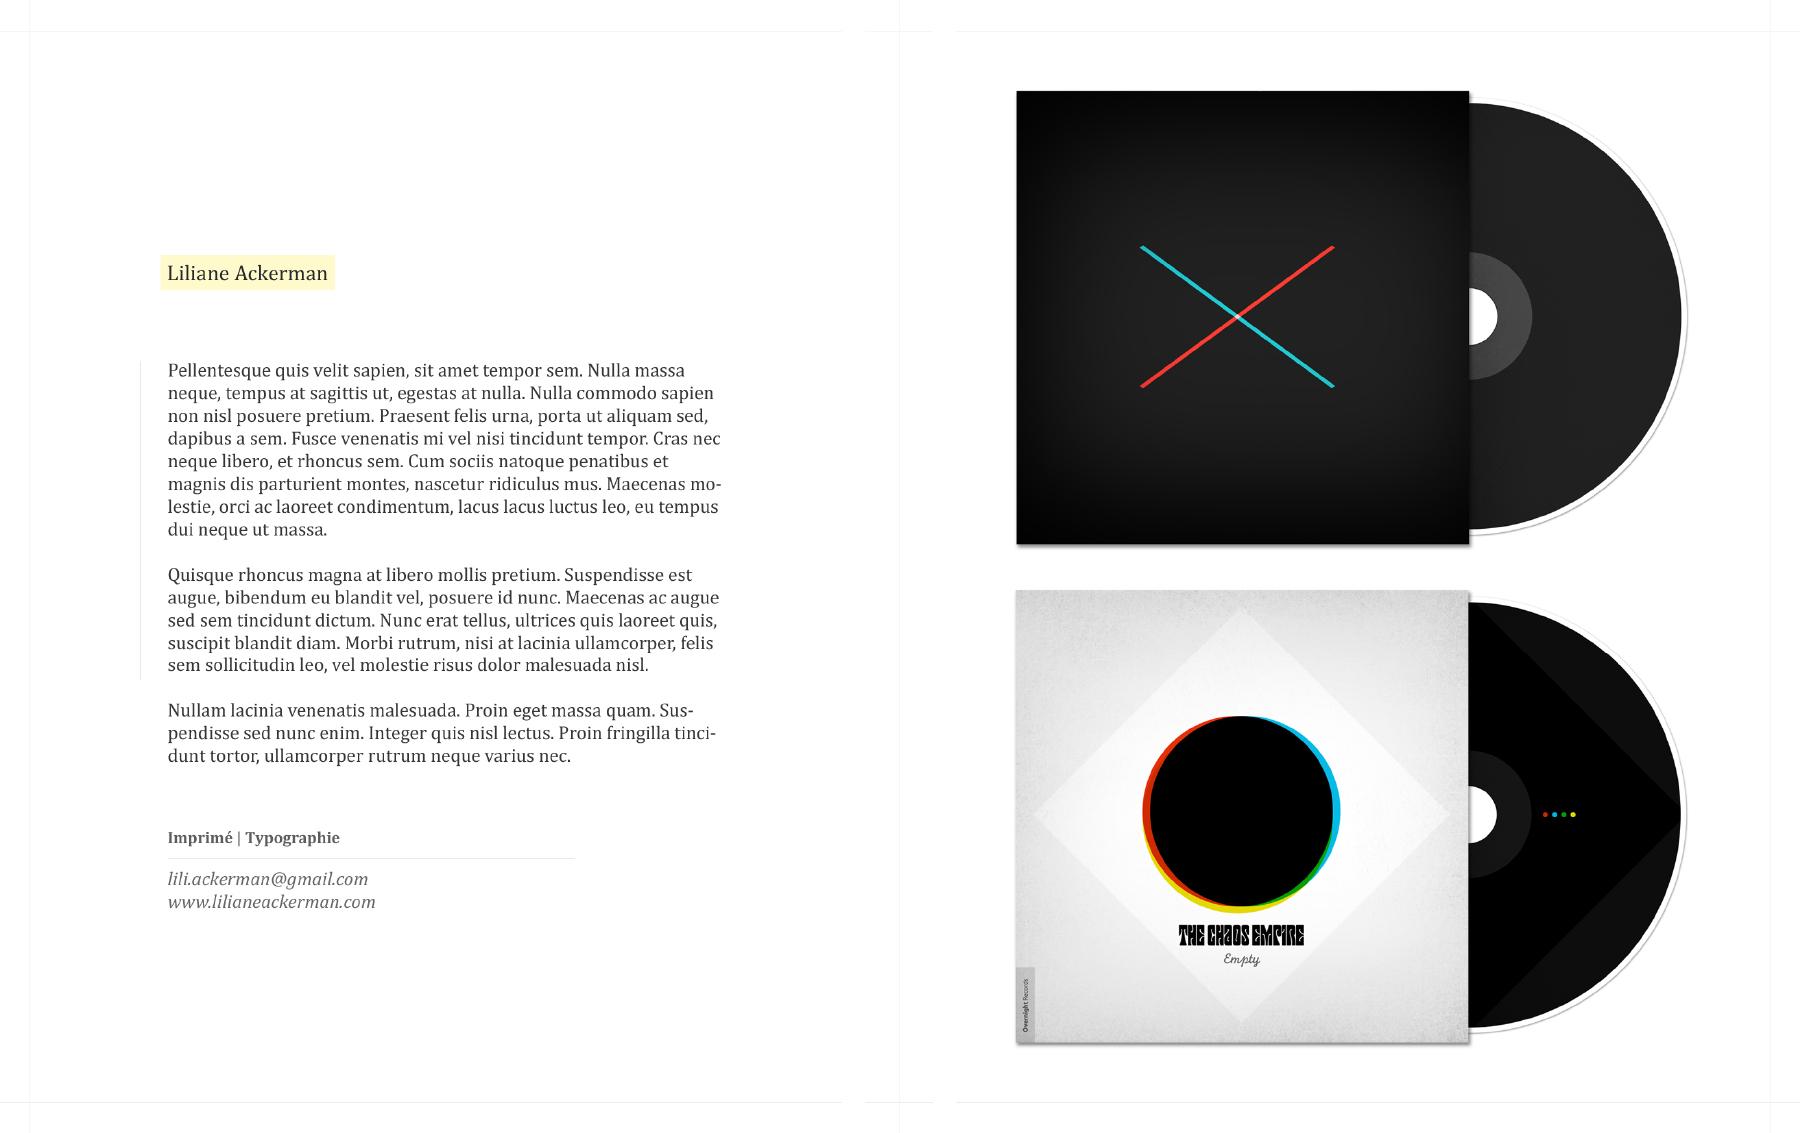 catalogue-7 copy.jpg